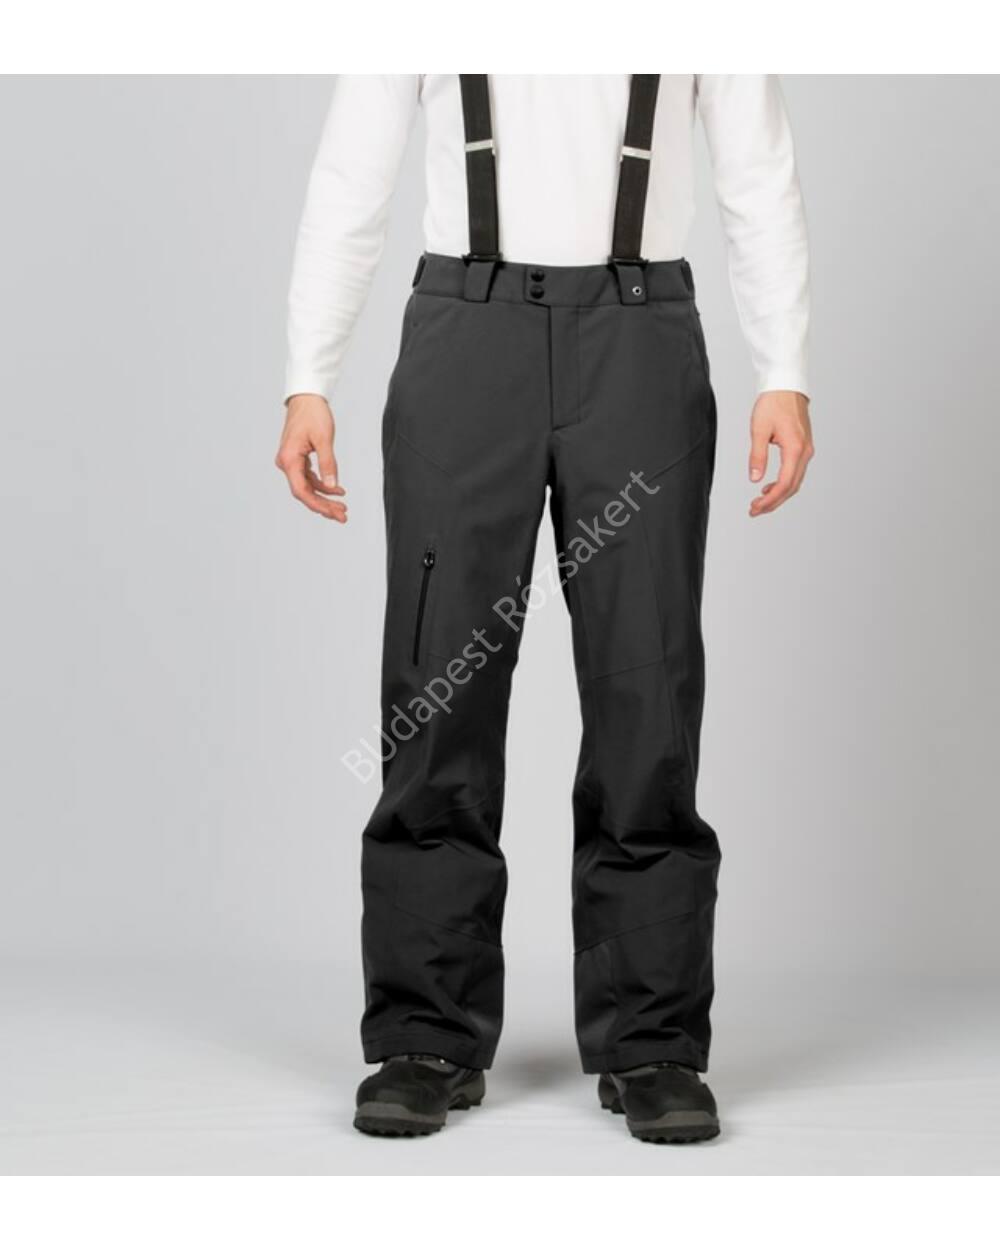 Spyder Dare Tailored férfi sínadrág, XL